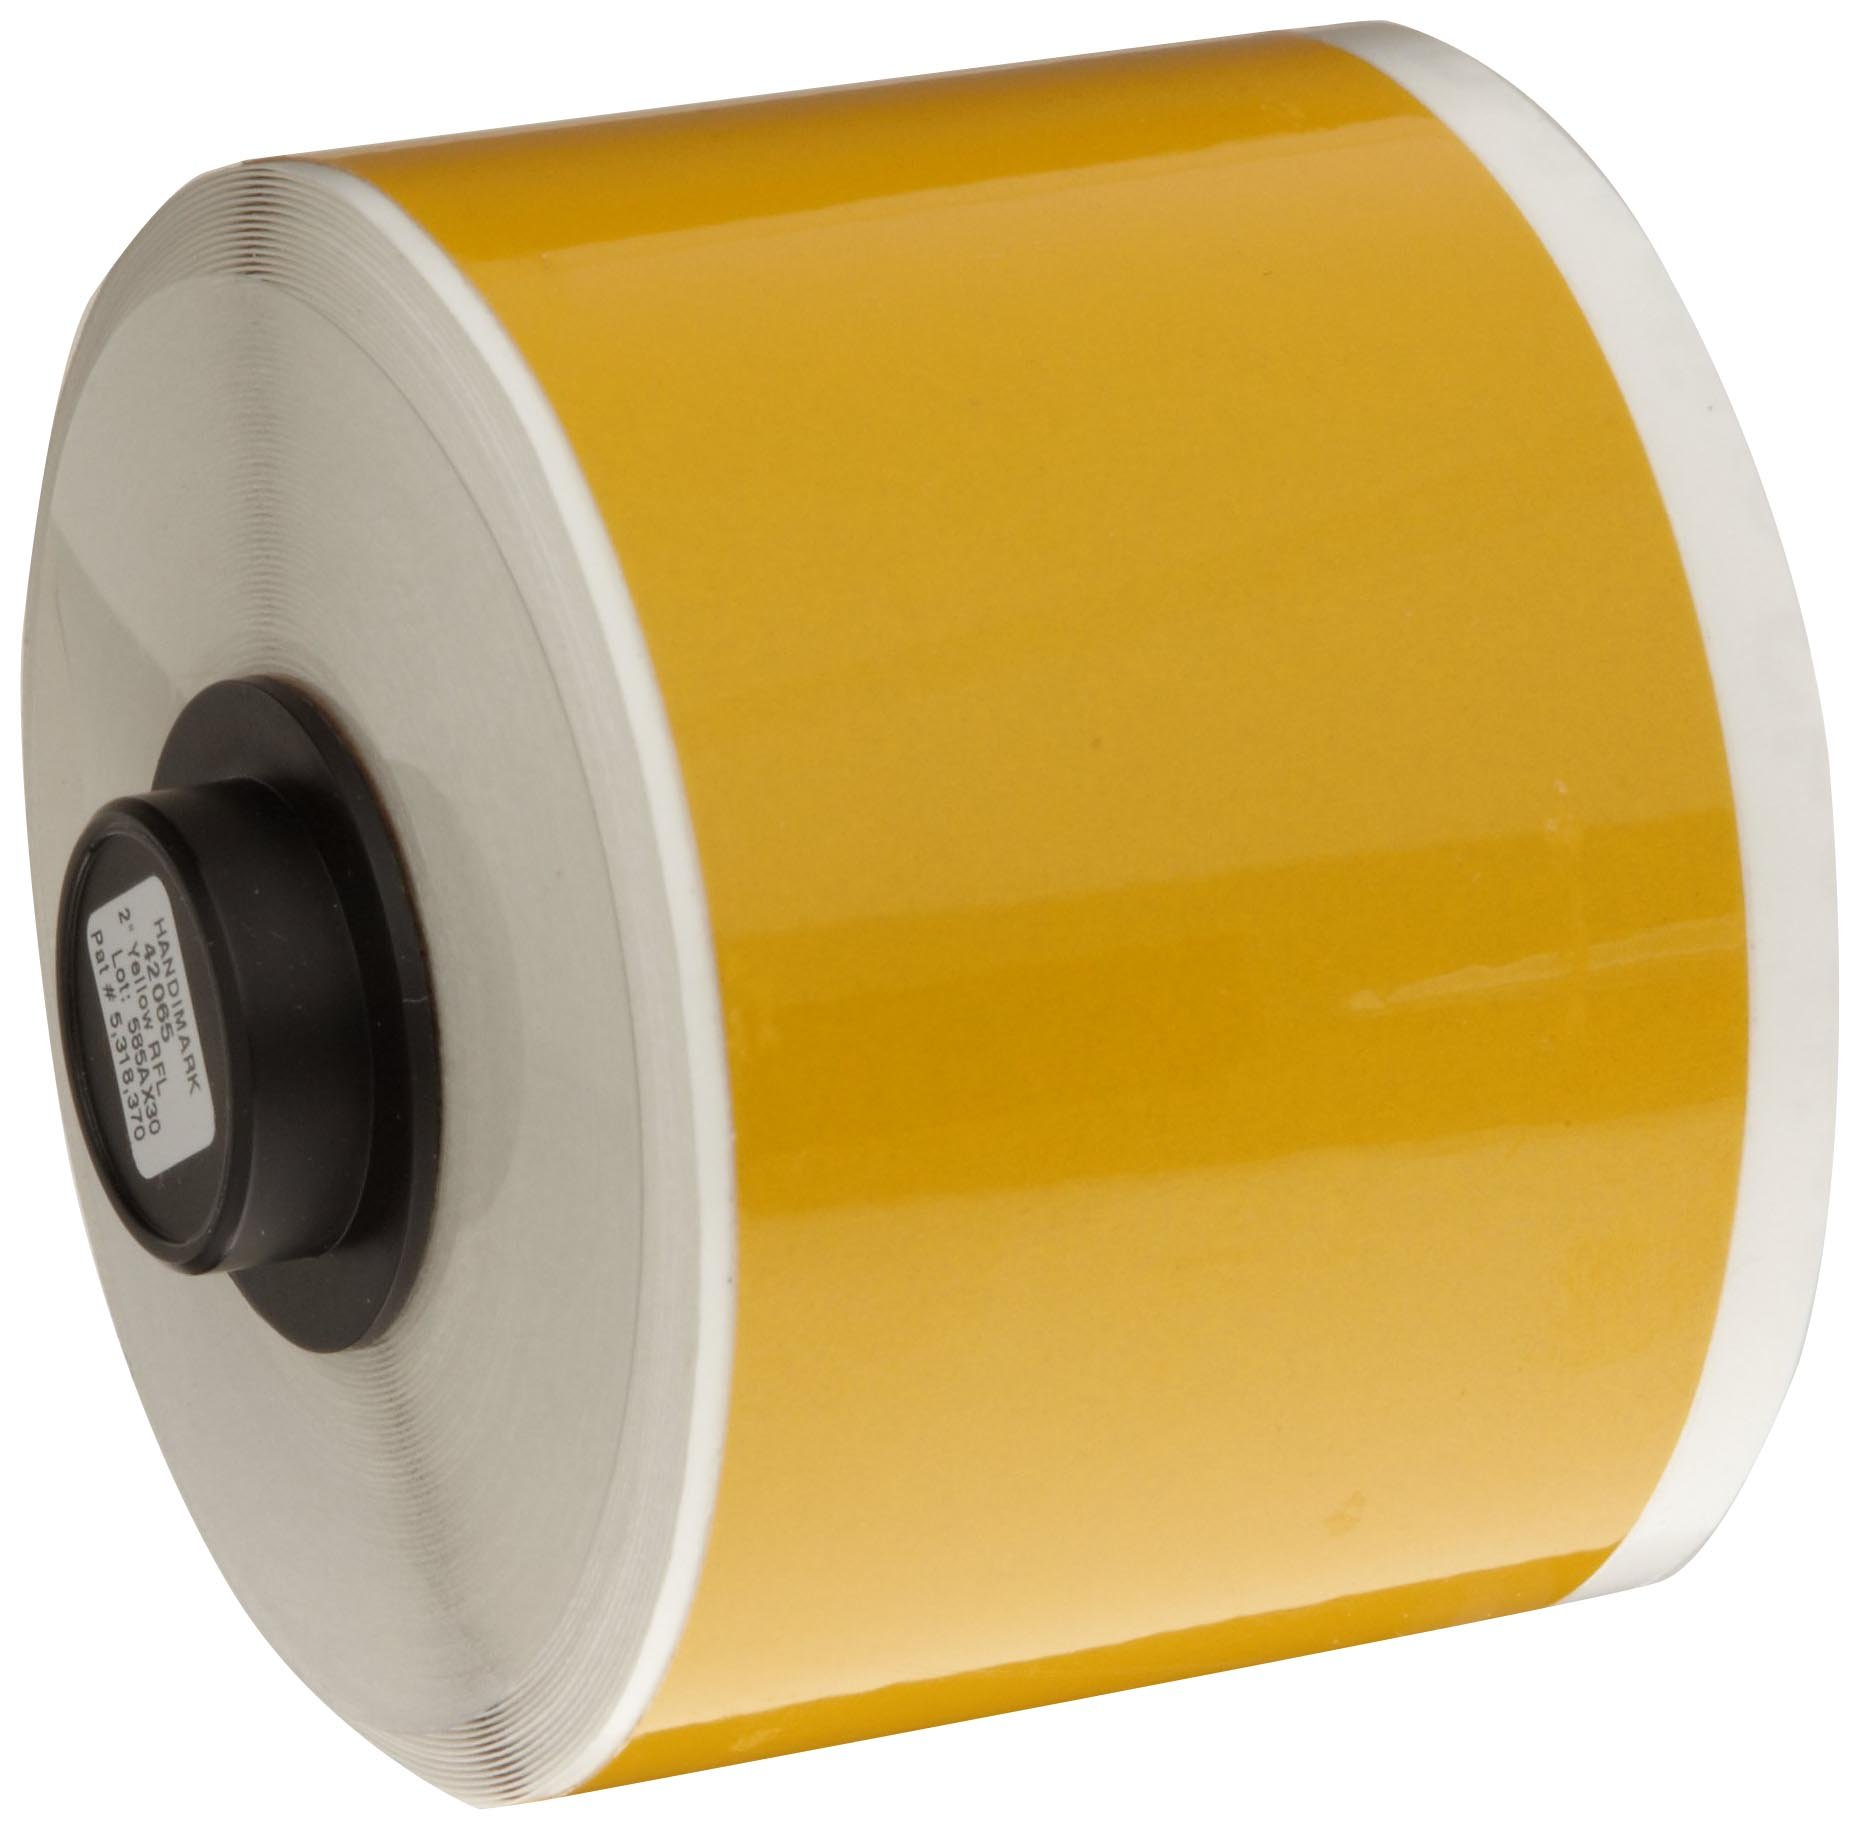 Brady Reflective HandiMark 33' Length 2'' Width, B-584 Sheeting Yellow Color Tape